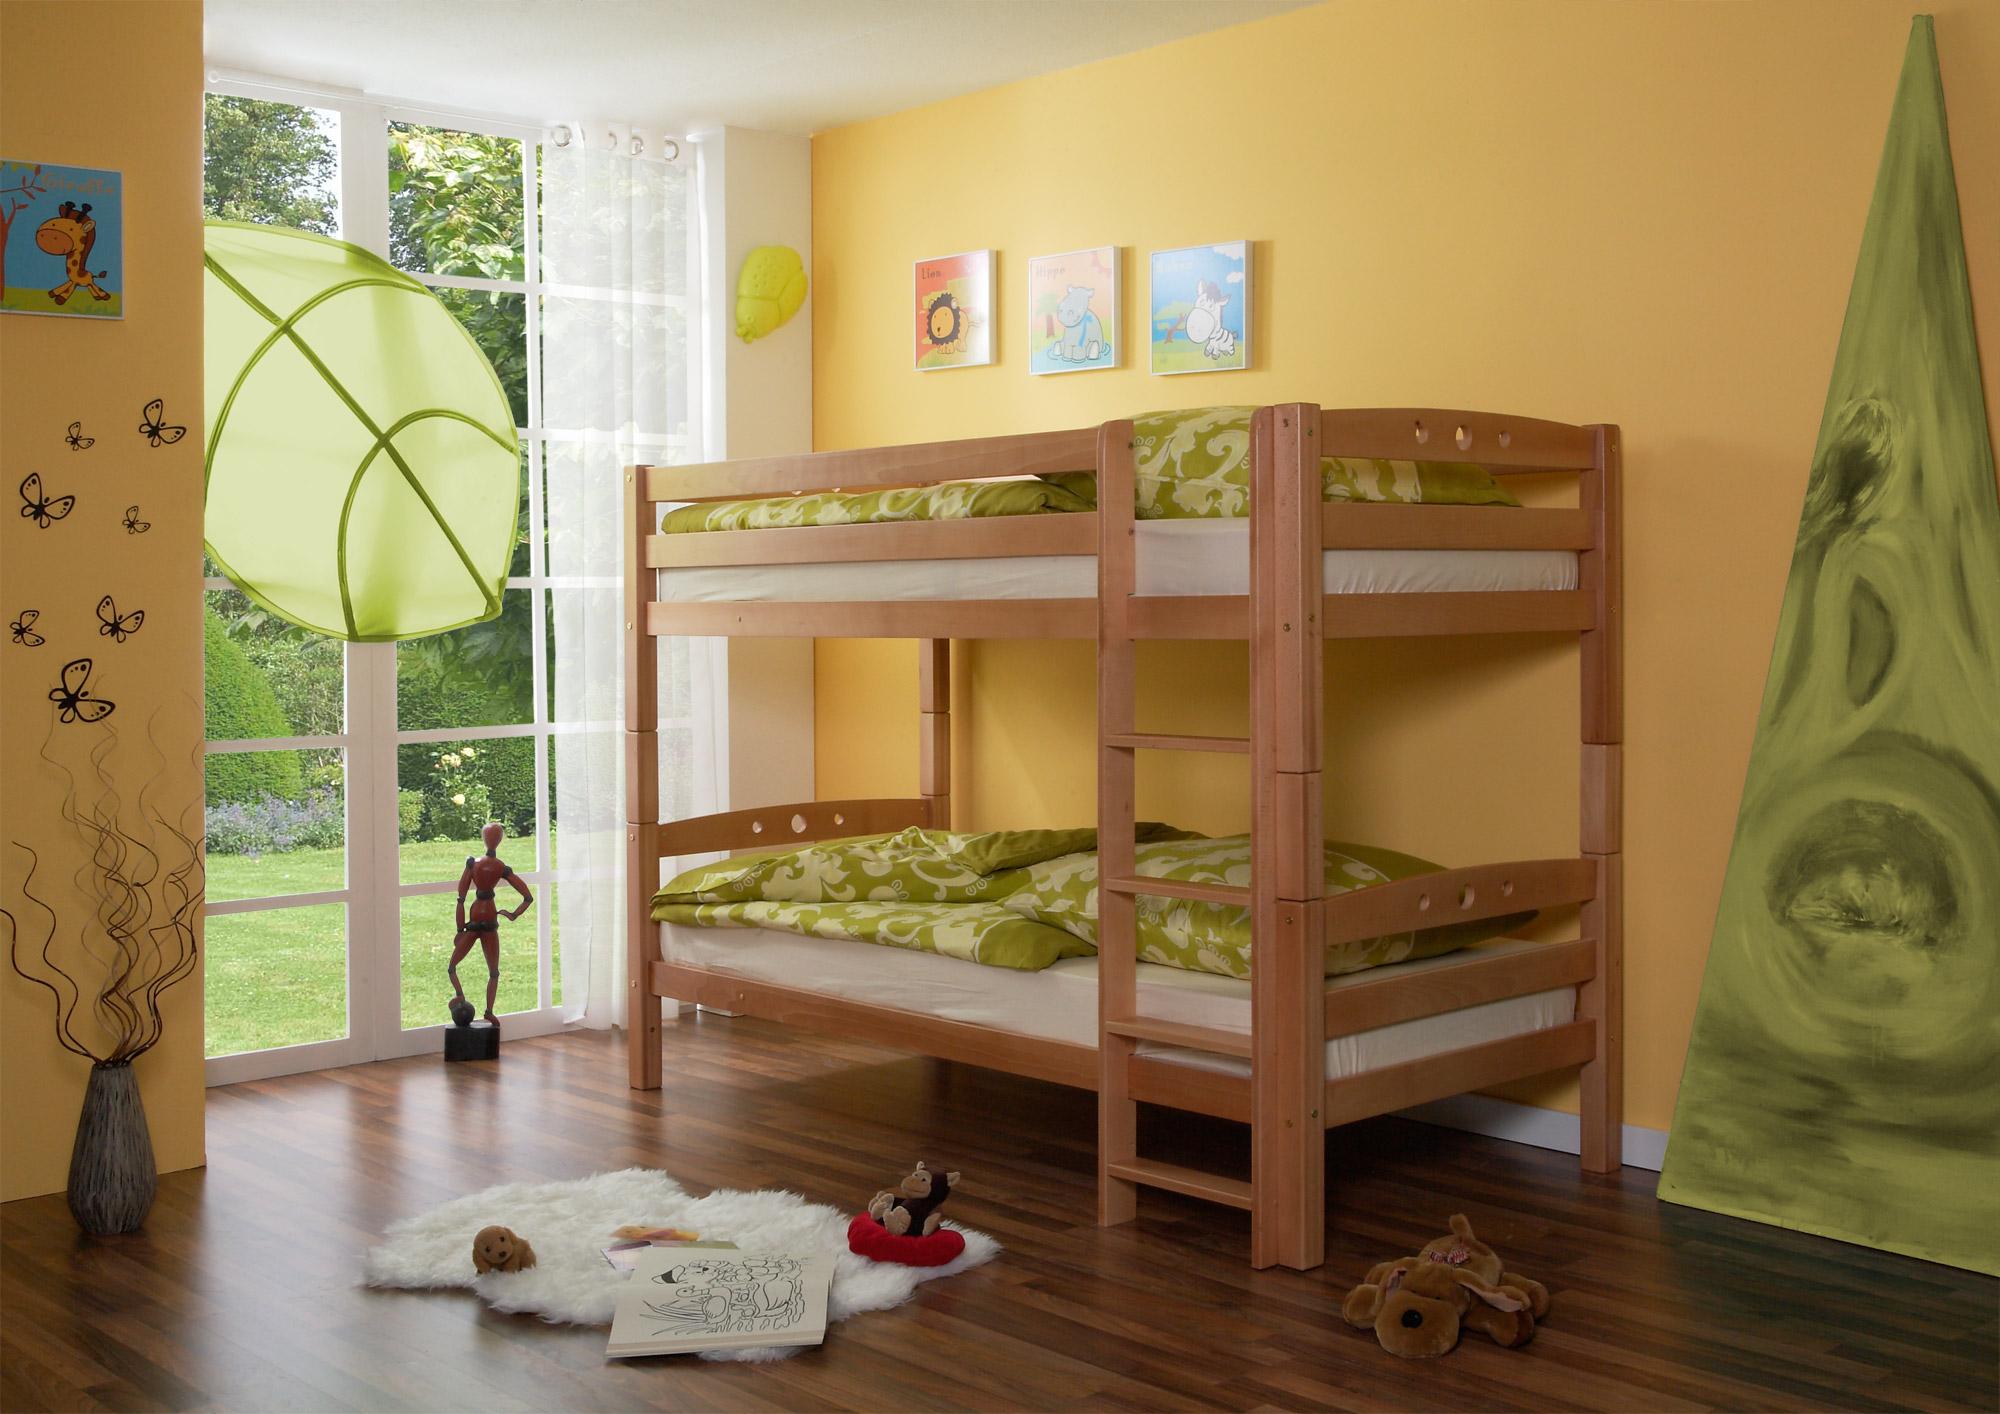 Etagenbett Kinder Massiv : Etagenbett doppelbett stockbett lupo buche massiv natur teilbar kind